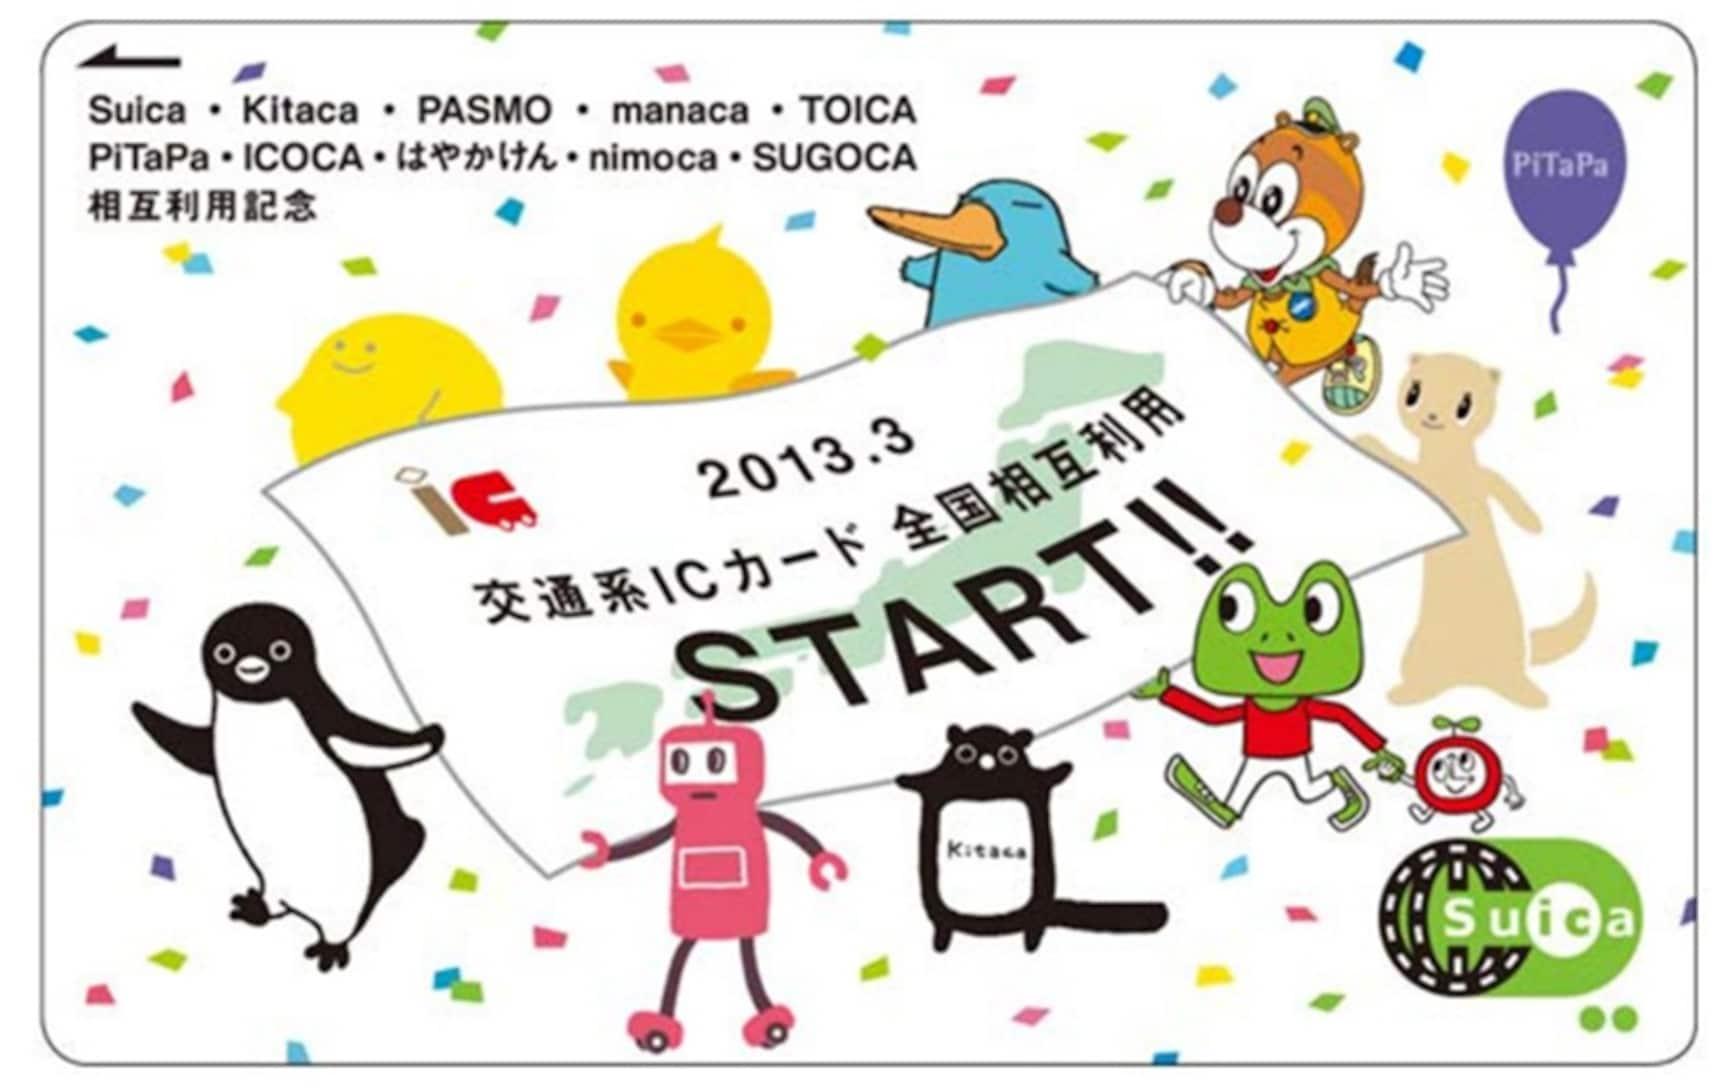 7 IC Card น่าเก็บสะสมของแต่ละภูมิภาคของญี่ปุ่น